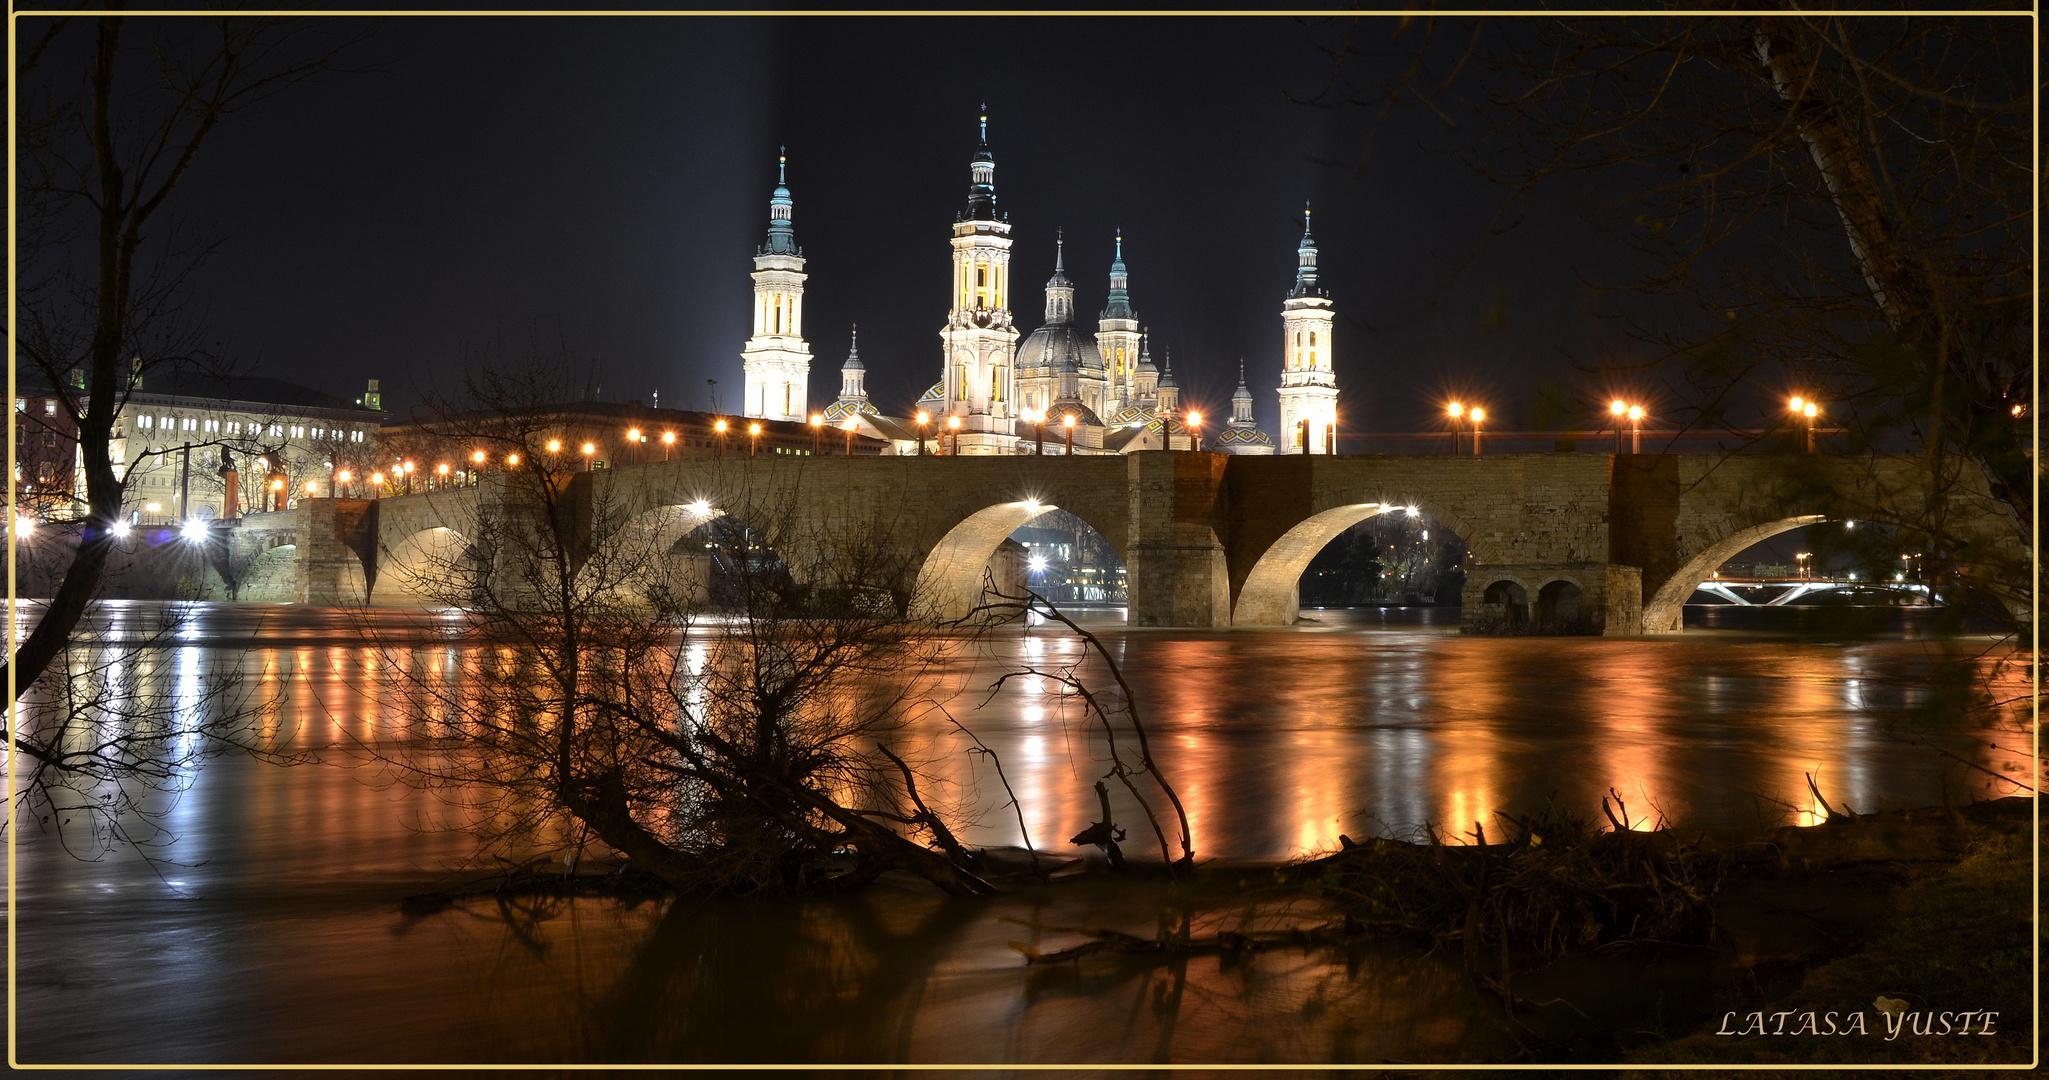 El Pilar de Noche